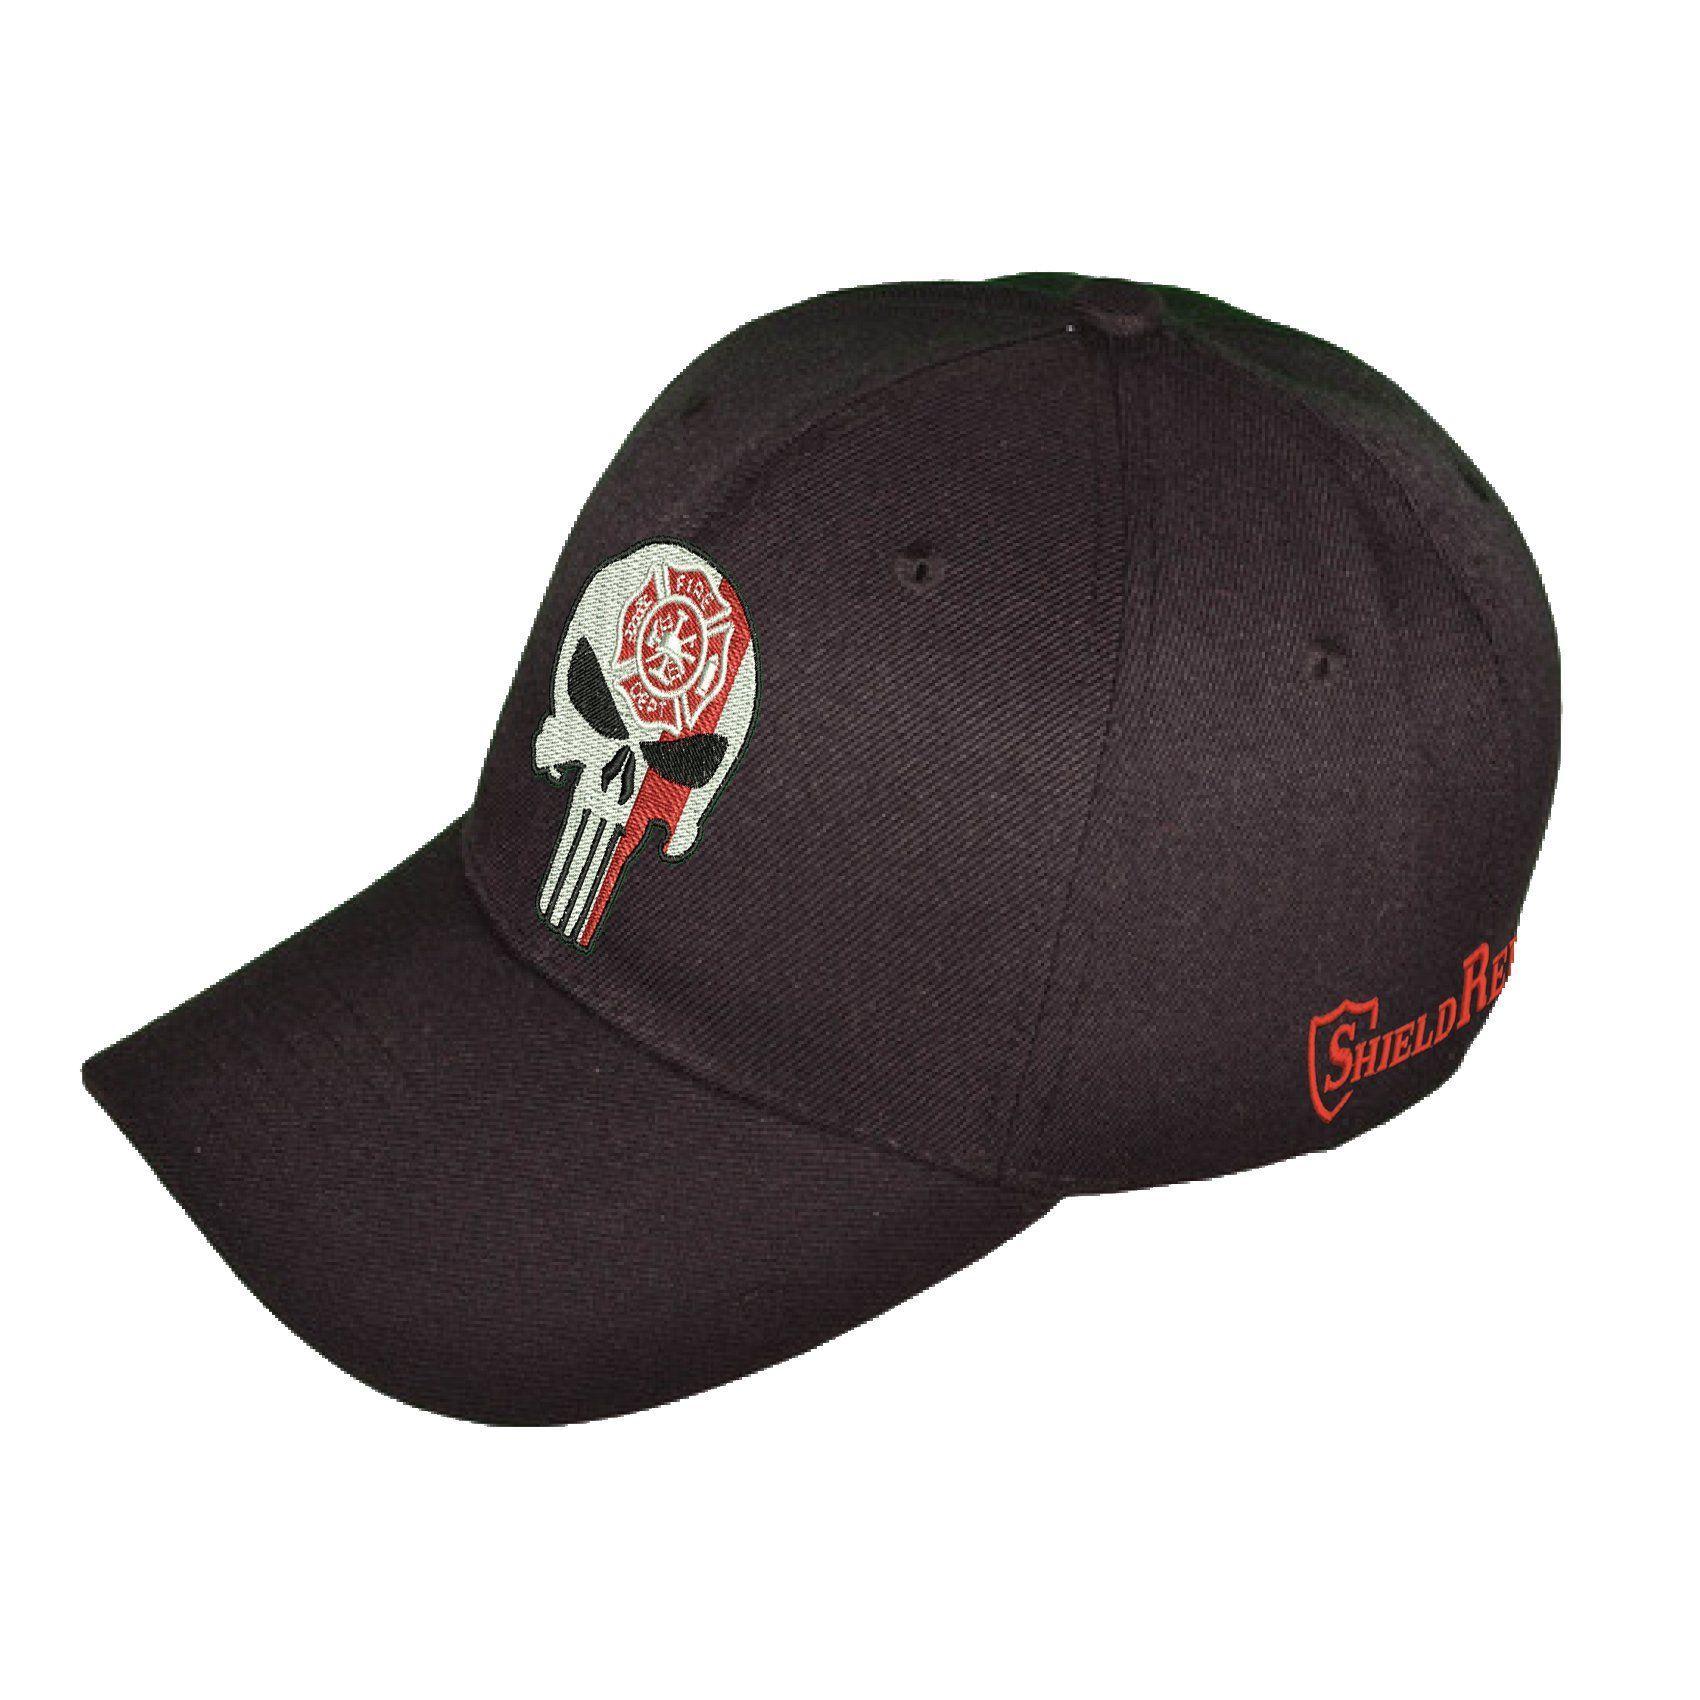 Firefighter flexfit hat hats flexfit blue line